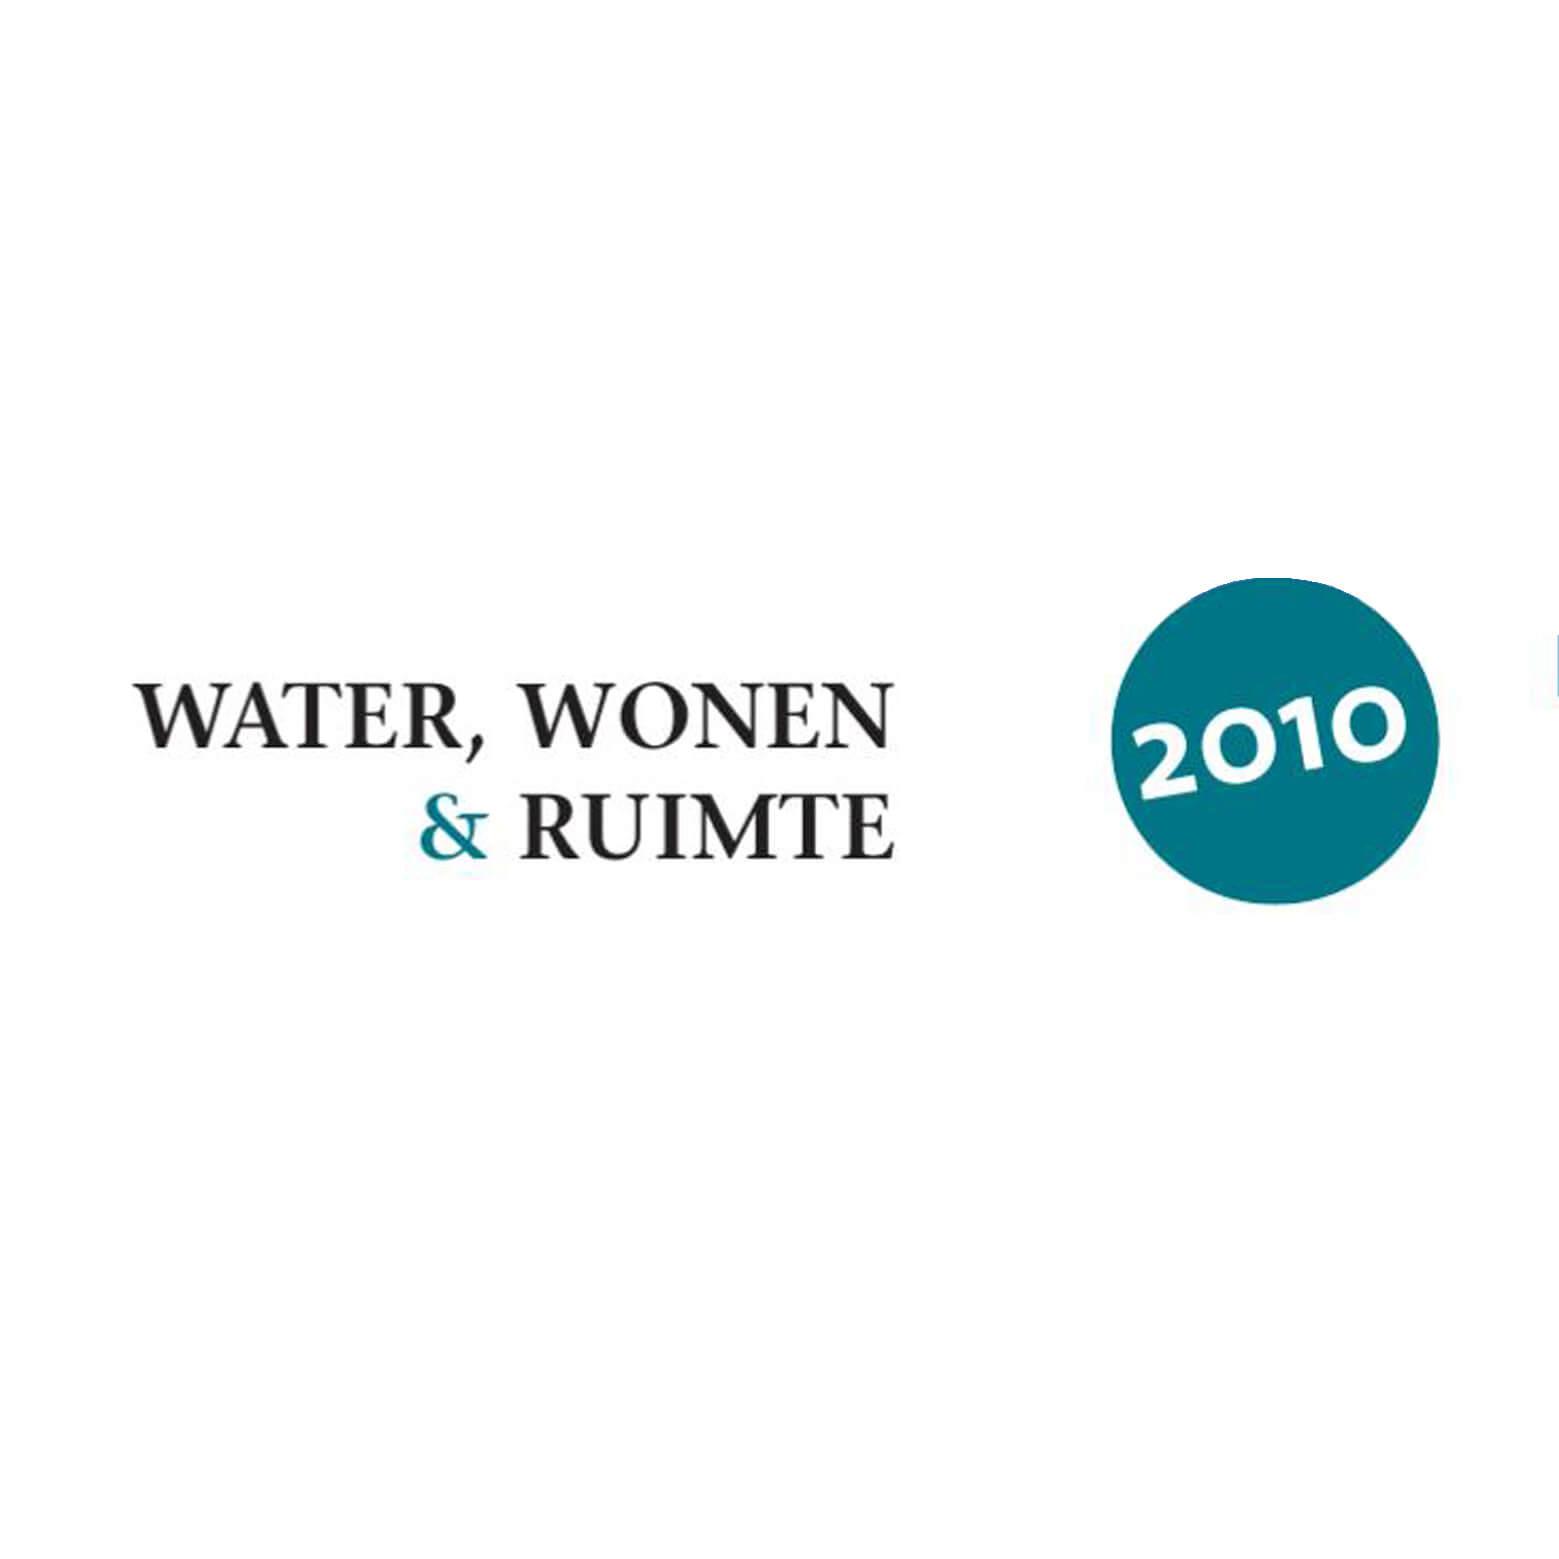 WWR Award Nomination